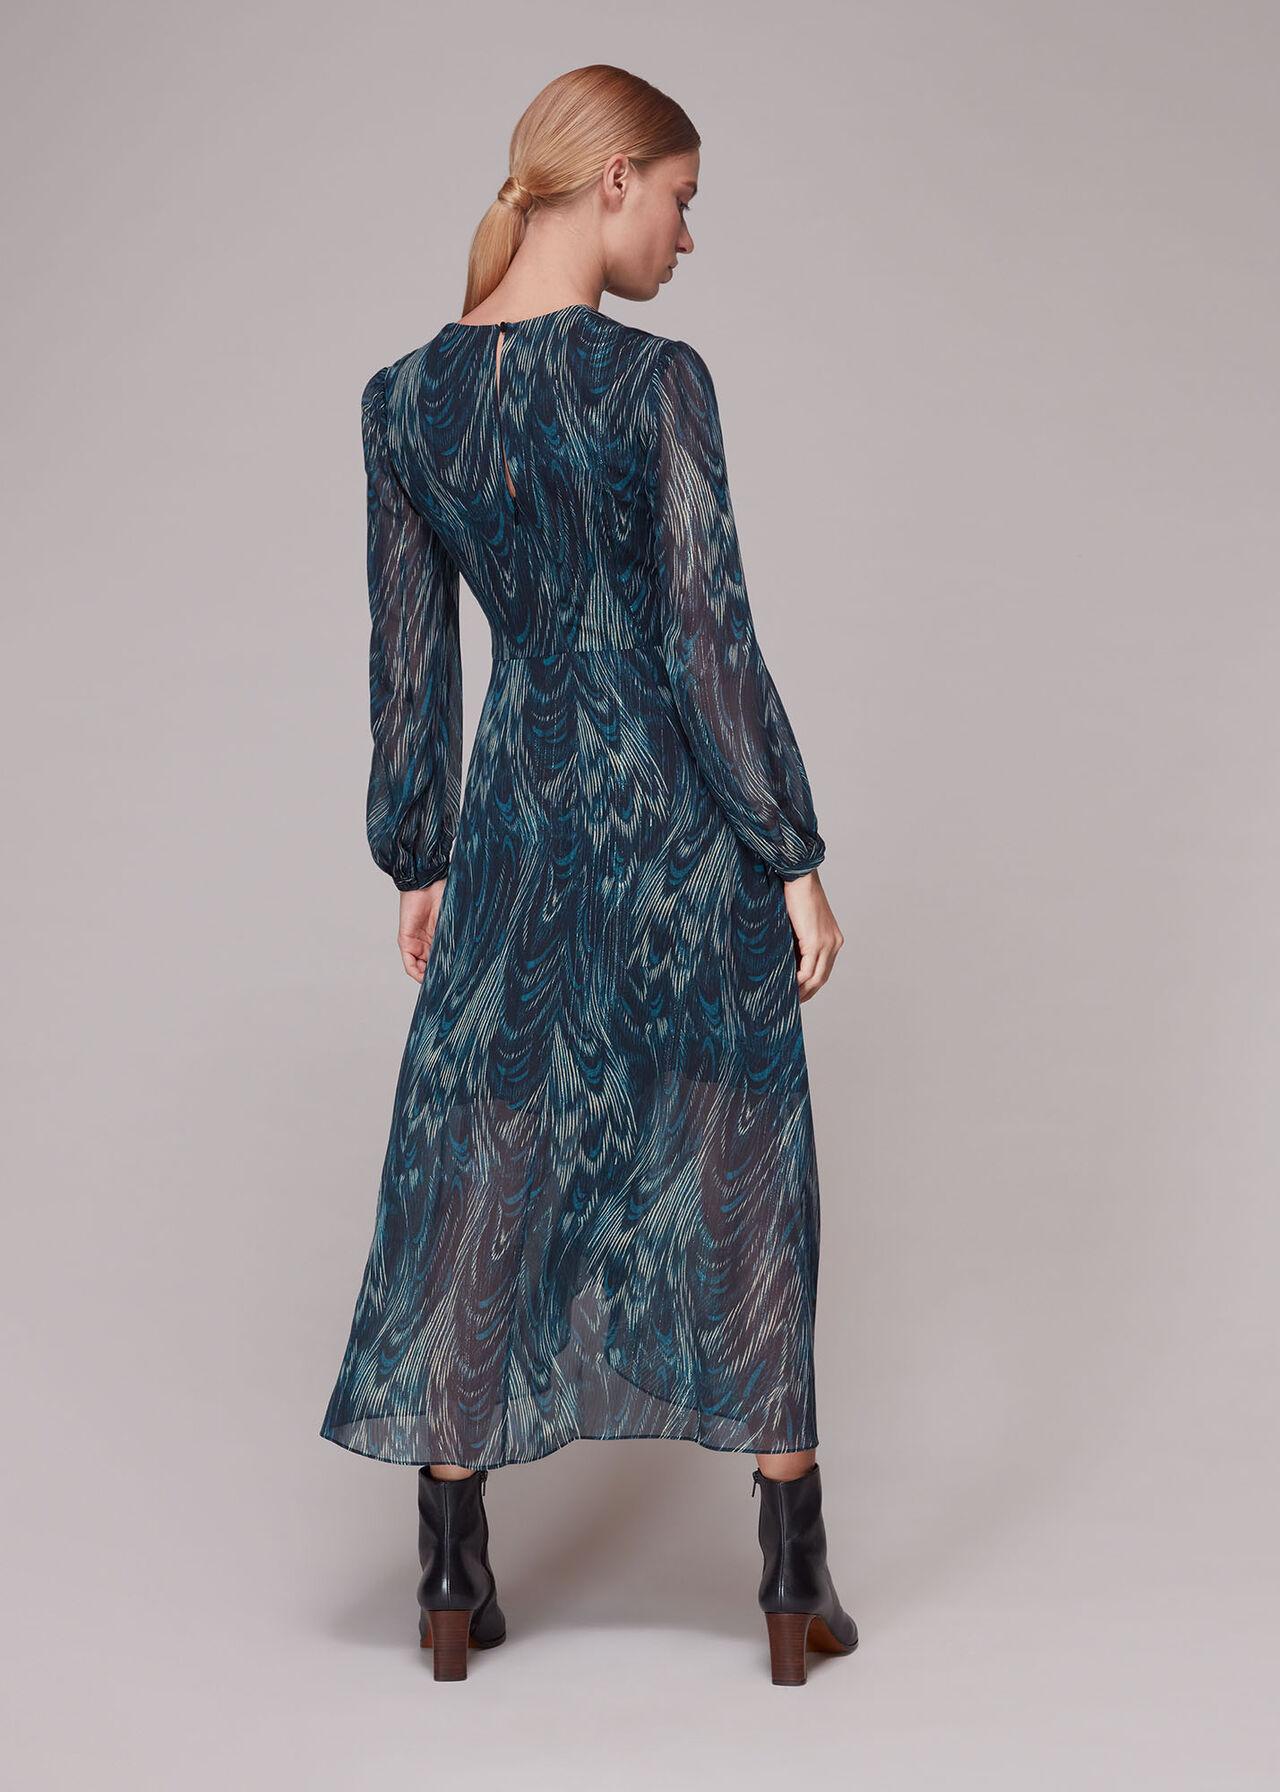 Wave Print Ruched Dress